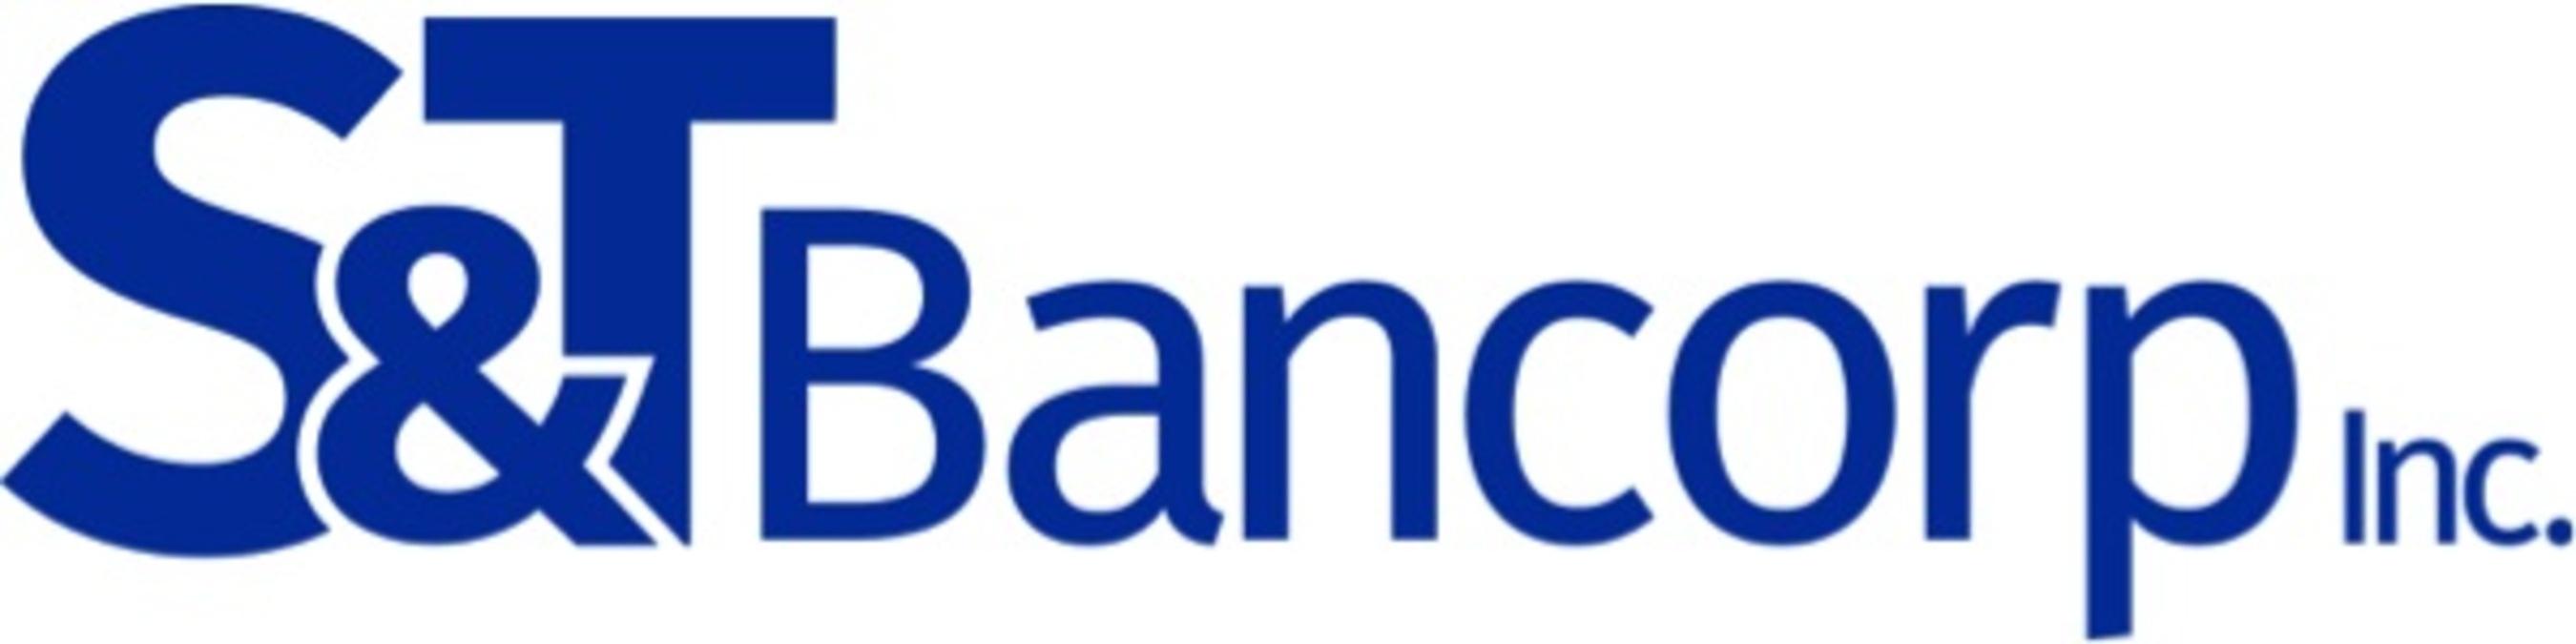 S&T Bancorp, Inc. Logo